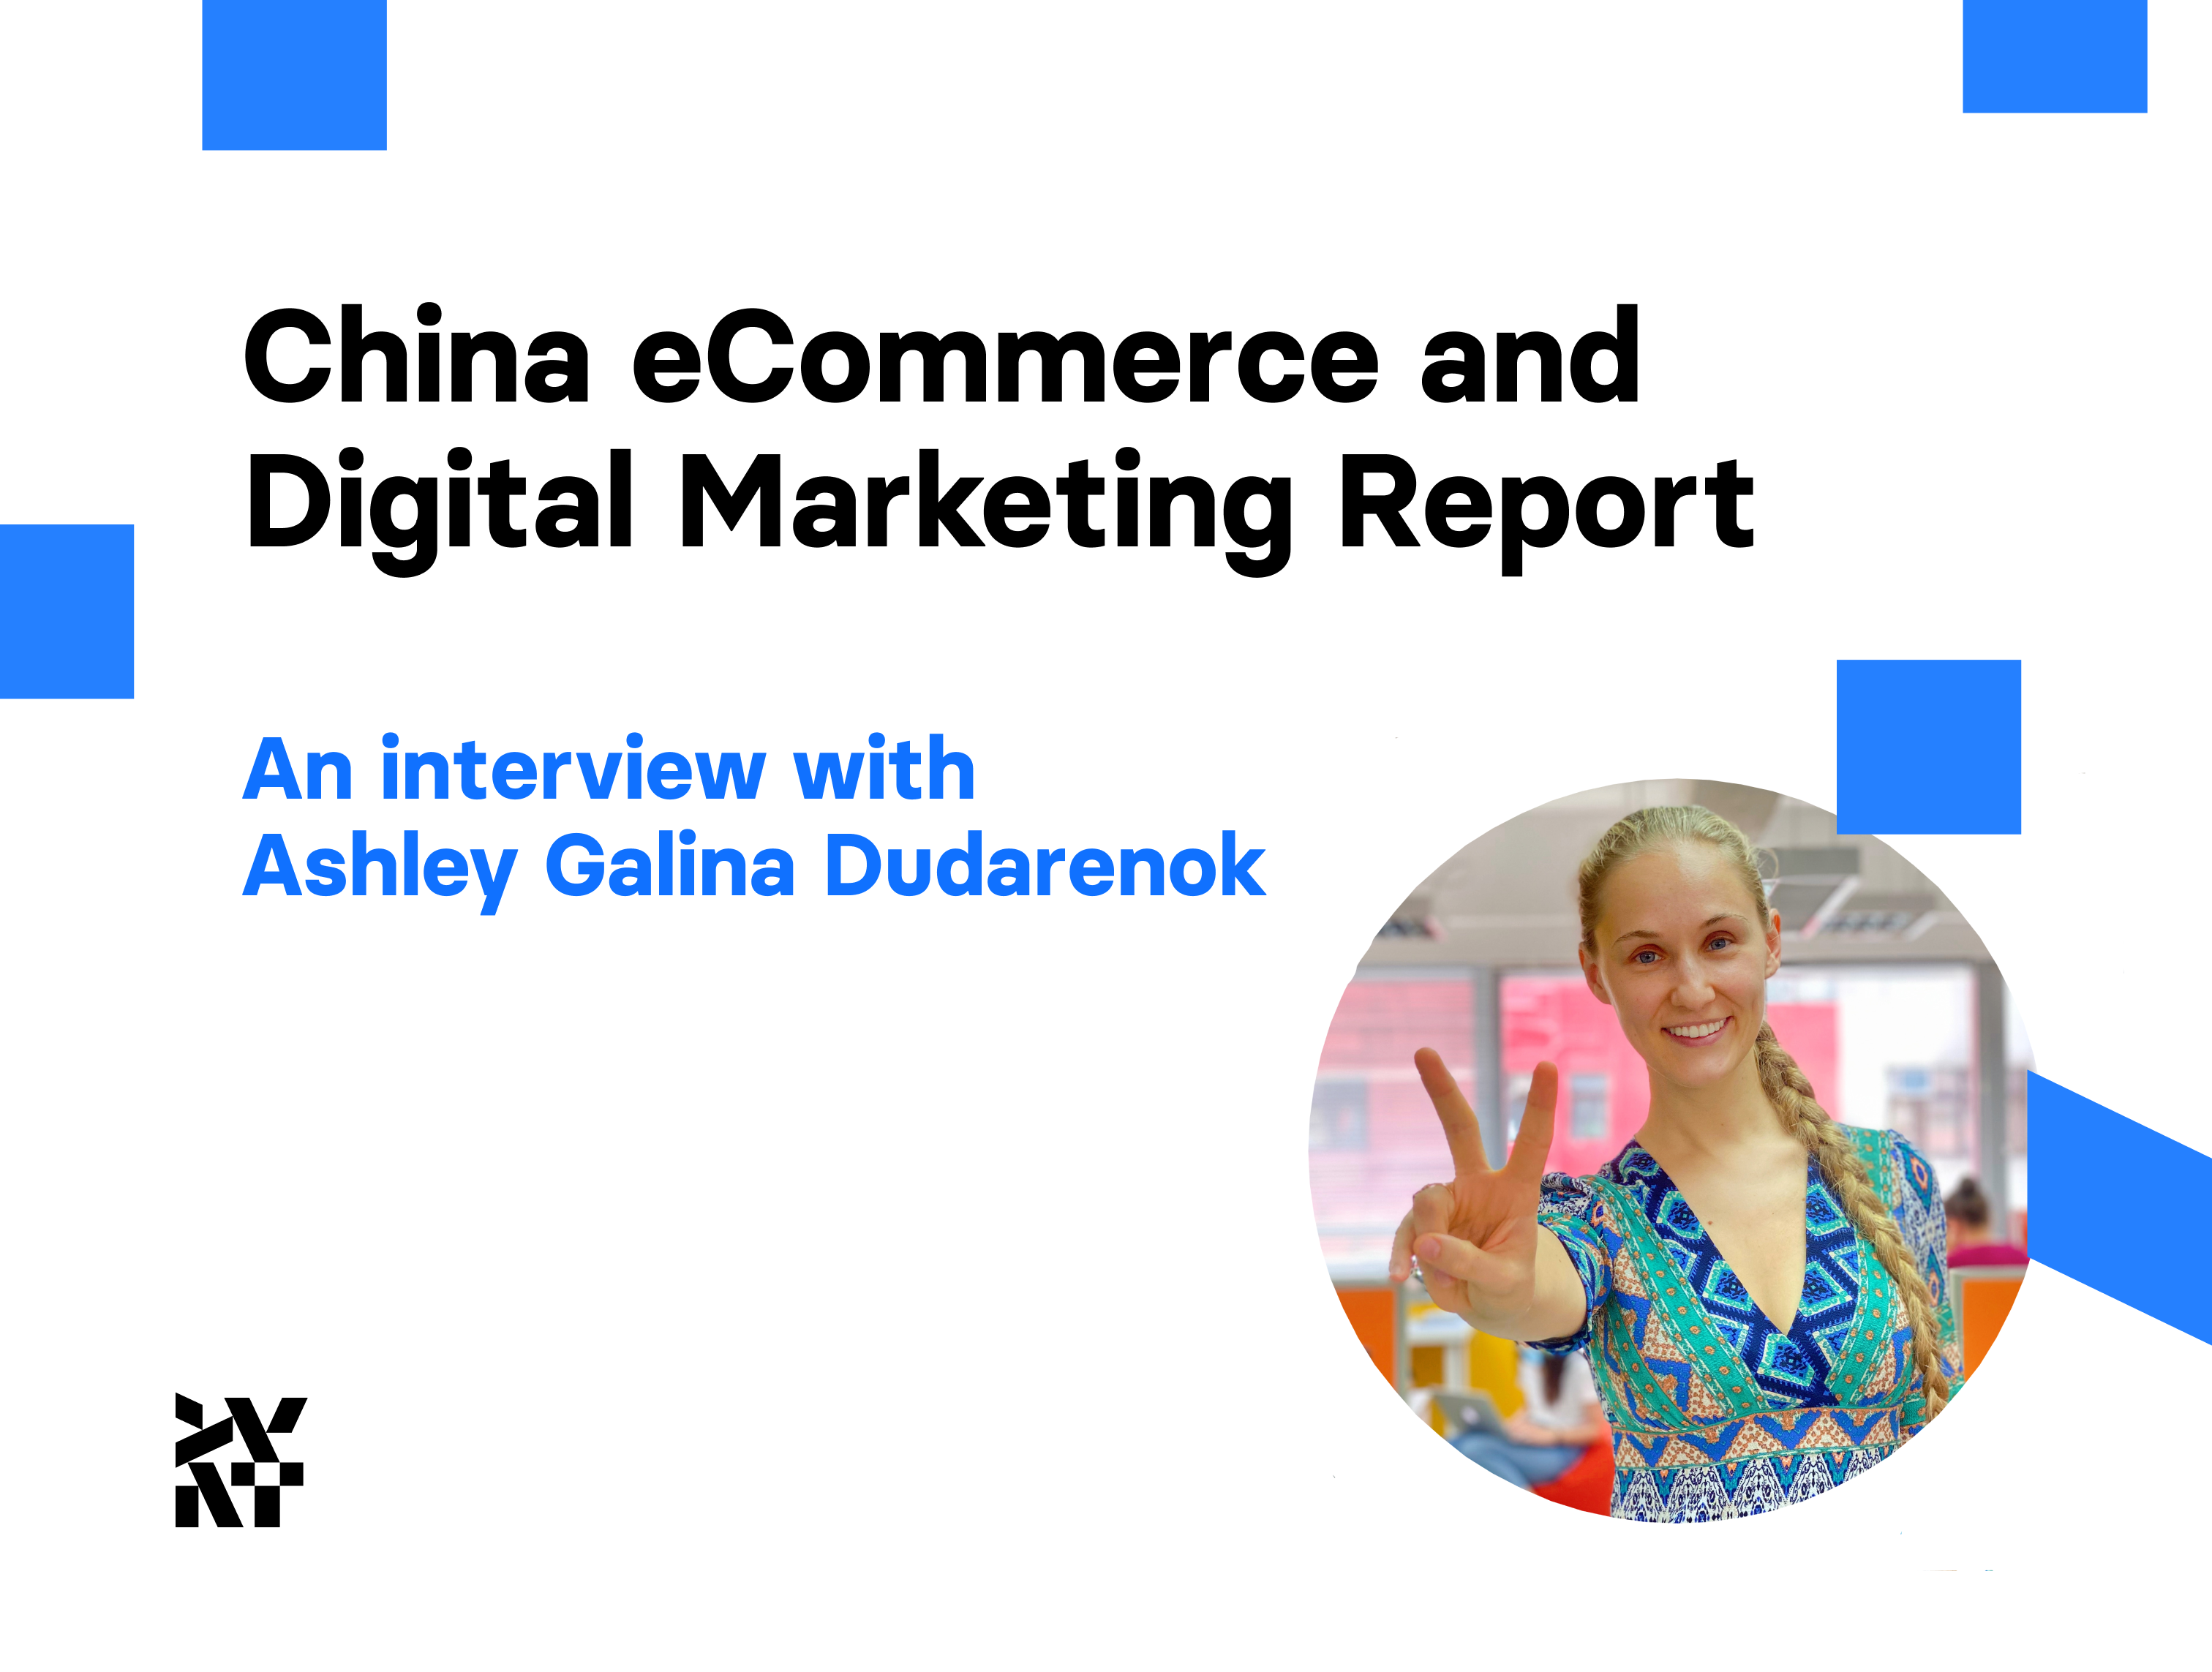 China eCommerce and Digital Marketing Report | Divante